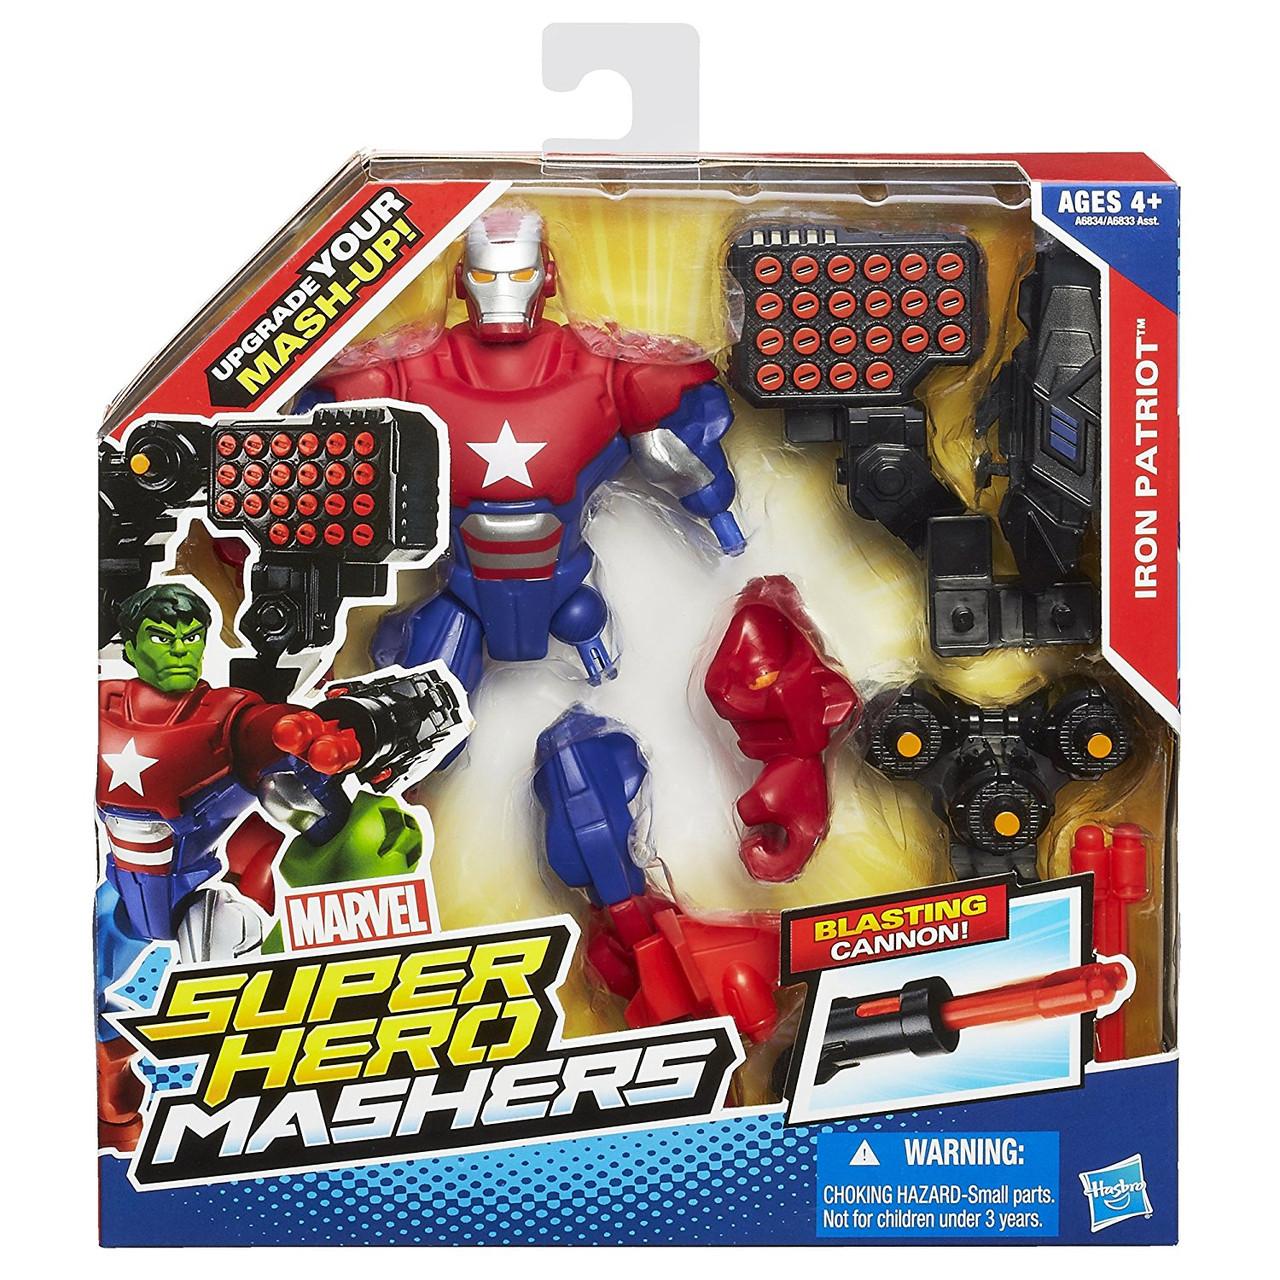 Разборная фигурка супергероя Железный патриот -  Iron Patriot, Super Hero Mashers, Hasbro